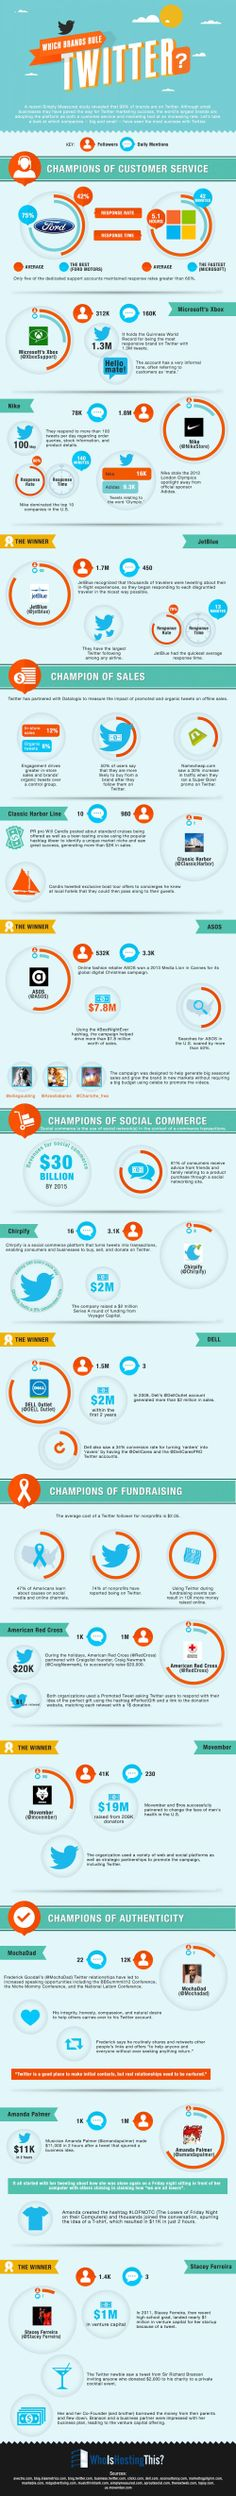 Infografik: Diese Marken sind bei Twitter besonders erfolgreich  http://www.social-secrets.com/2014/02/infografik-diese-marken-sind-bei-twitter-besonders-erfolgreich/